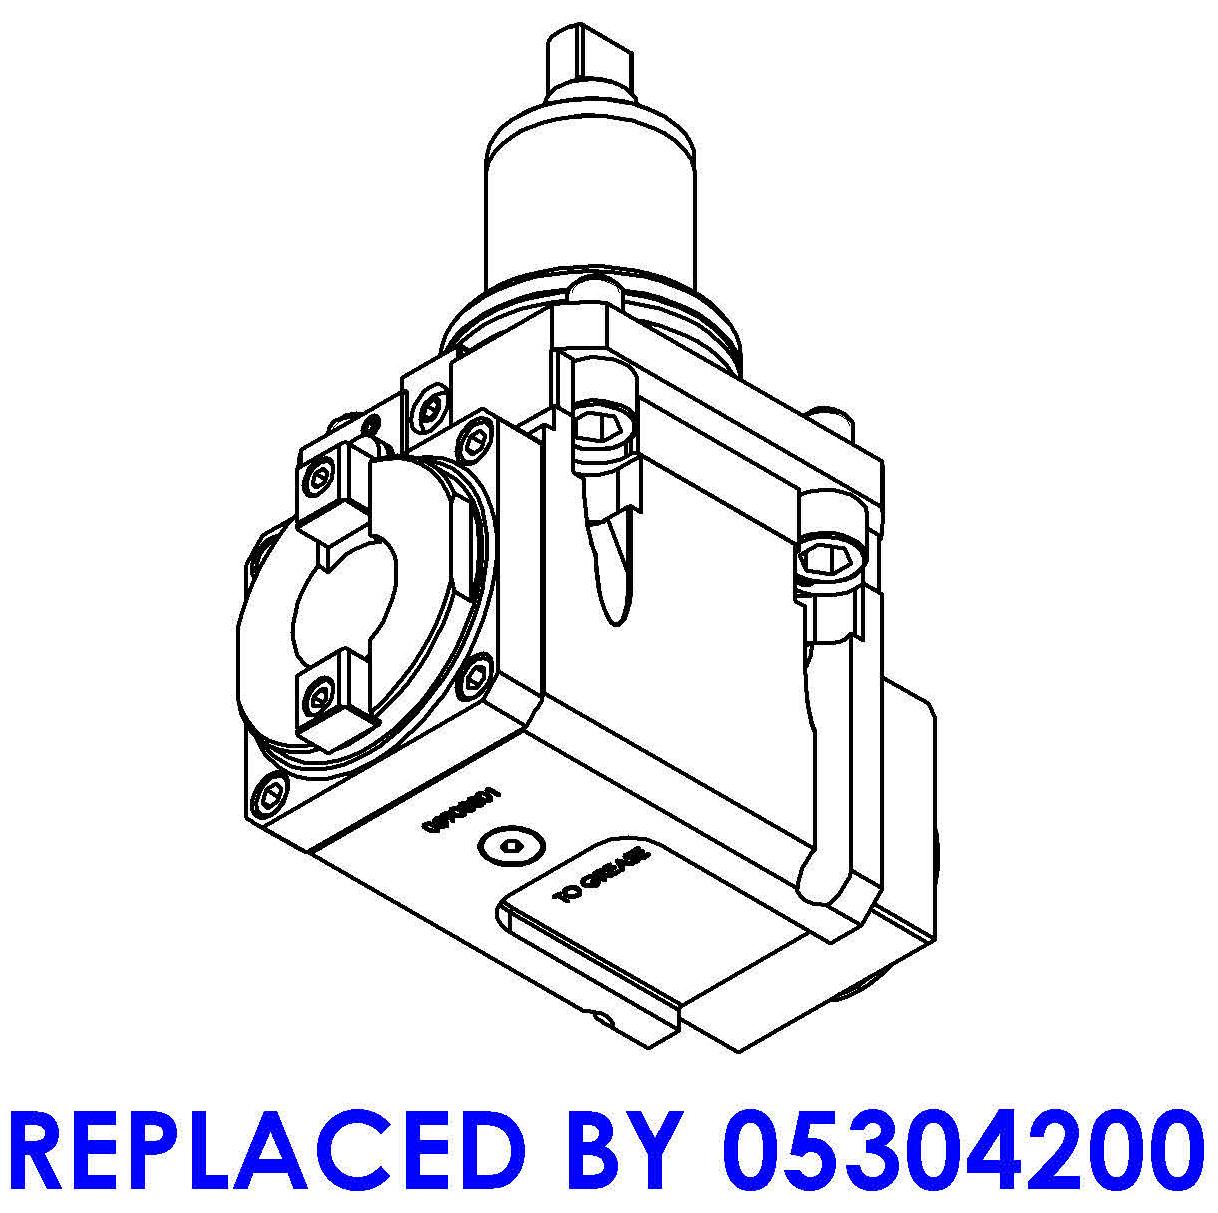 LT-A BMT65 ISO-BT30 L-R RF H72.